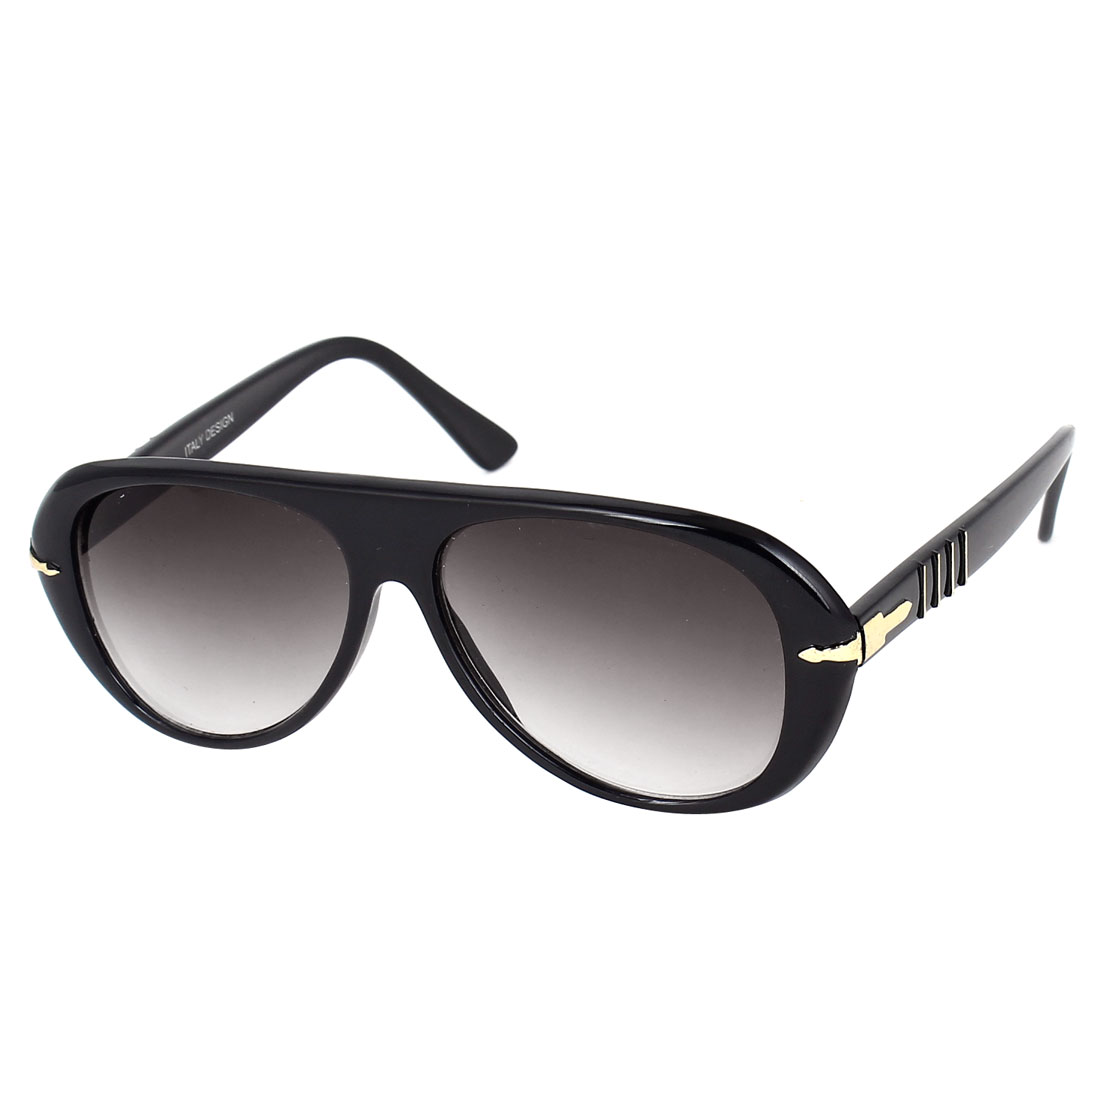 Lady Plastic Full Rim Single Bridge Water Drop Lens Glasses Sunglasses Black